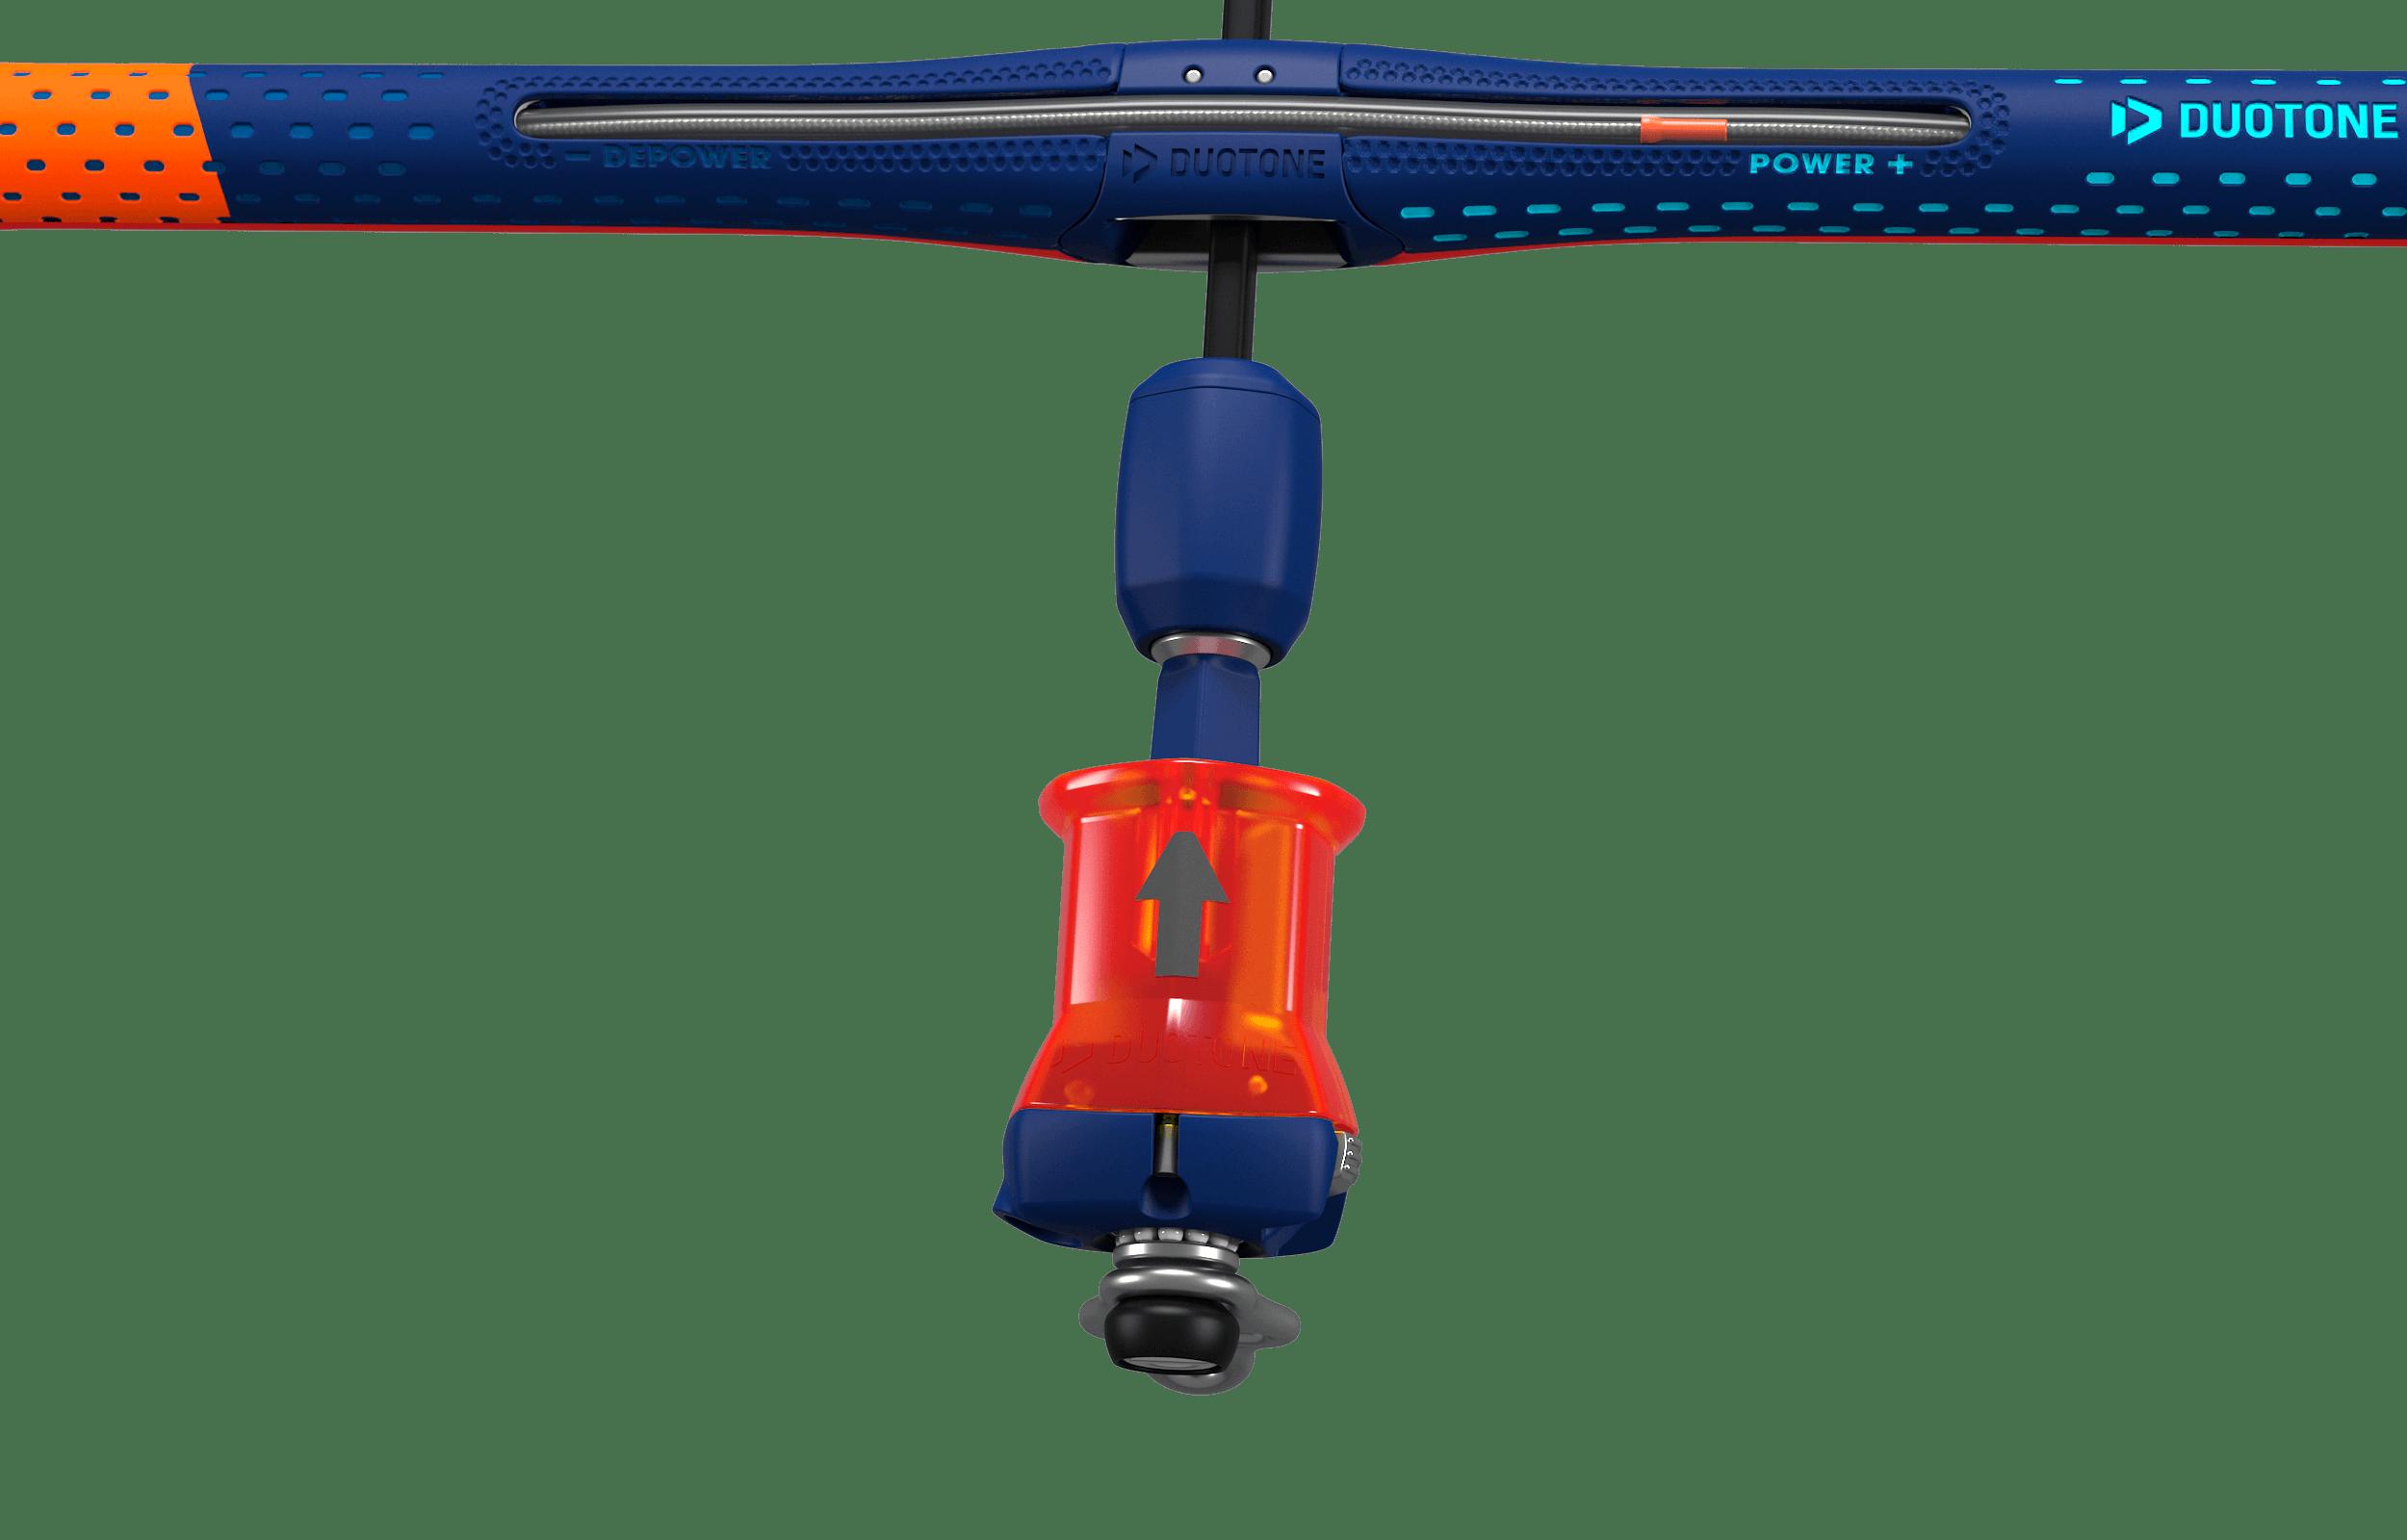 DUOTONE Click Bar ᐅ Your best kite bar for maximum control!